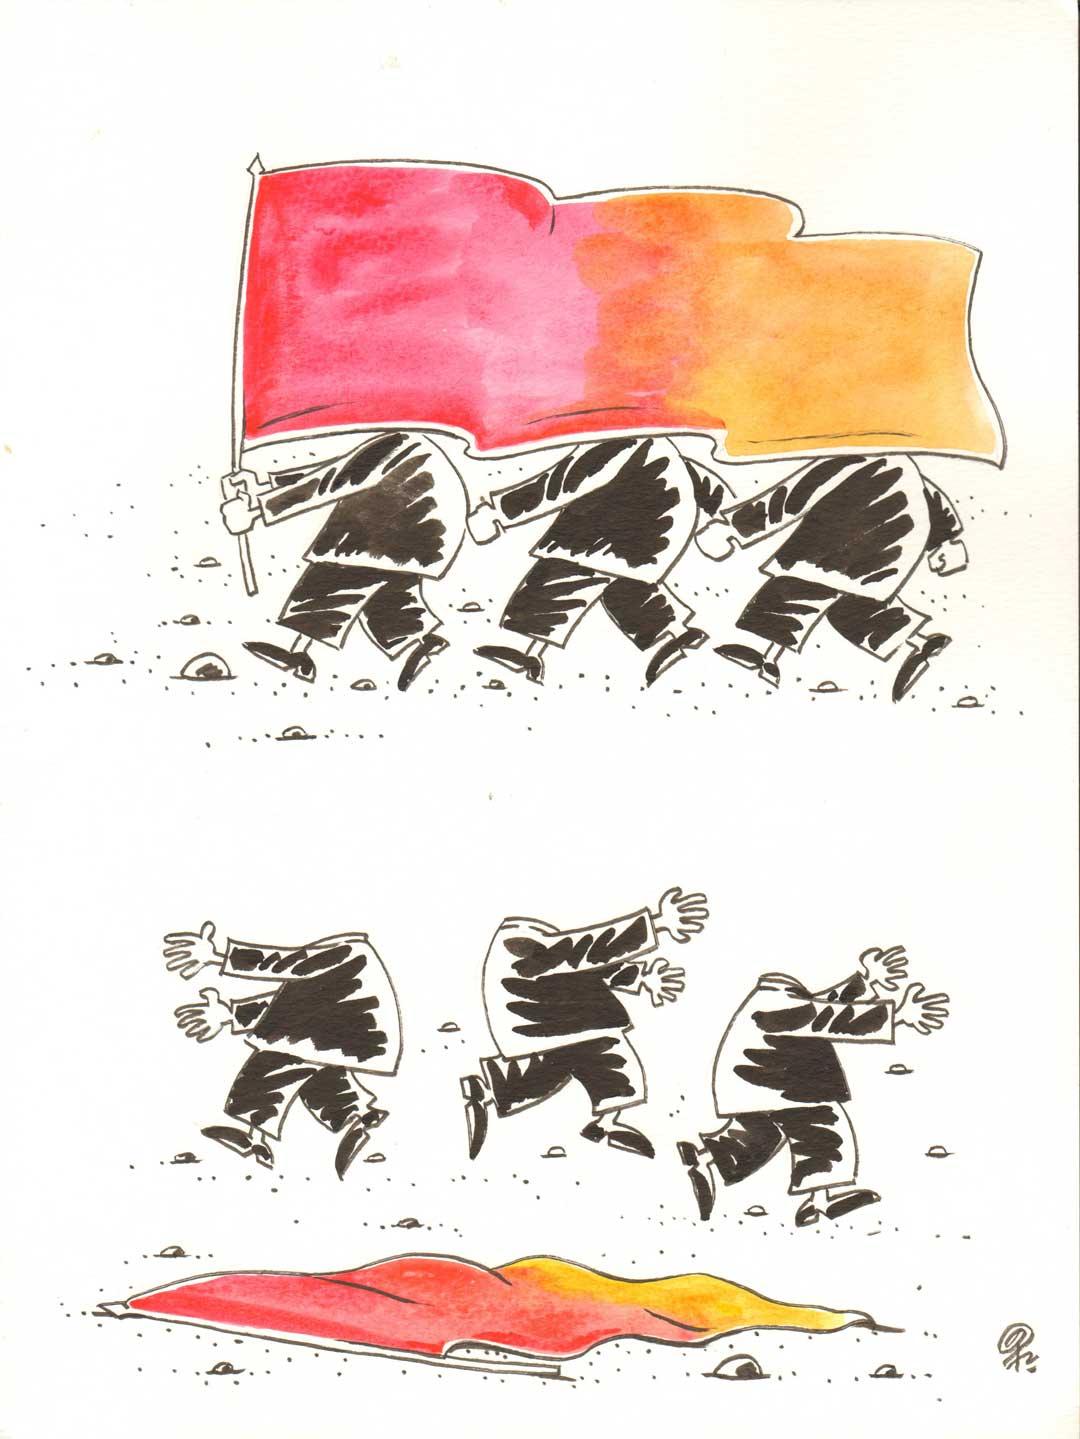 Bilig BA -Bilig BA (China) – the First Award for Comic/Strip